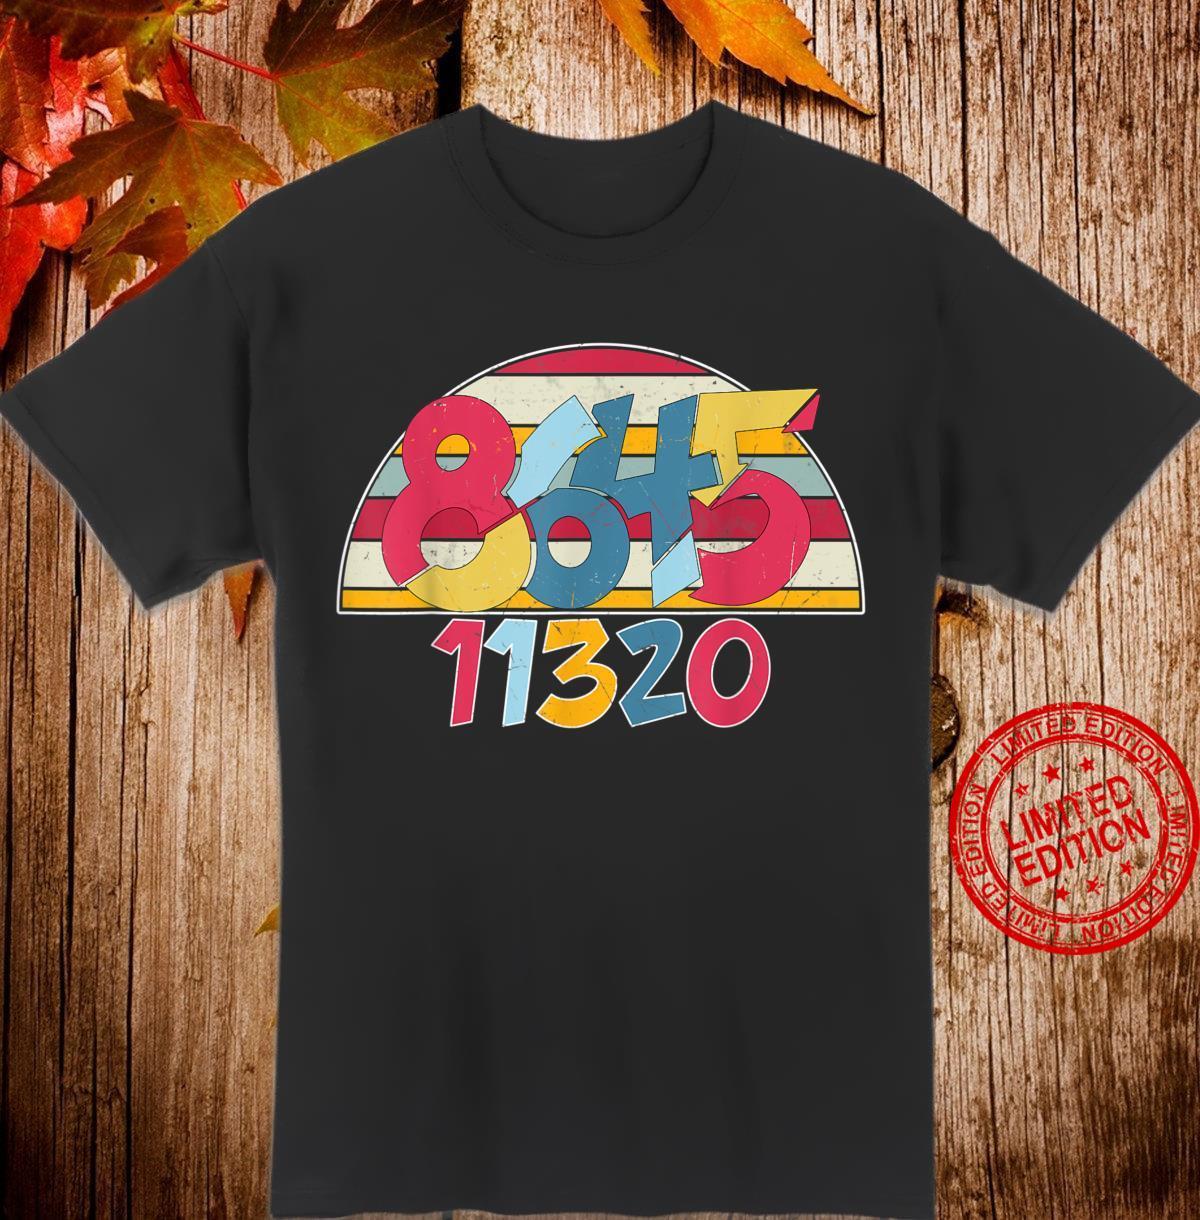 86 45 Shirt 86451132020 Anti Trump Election Classic Vintage Shirt